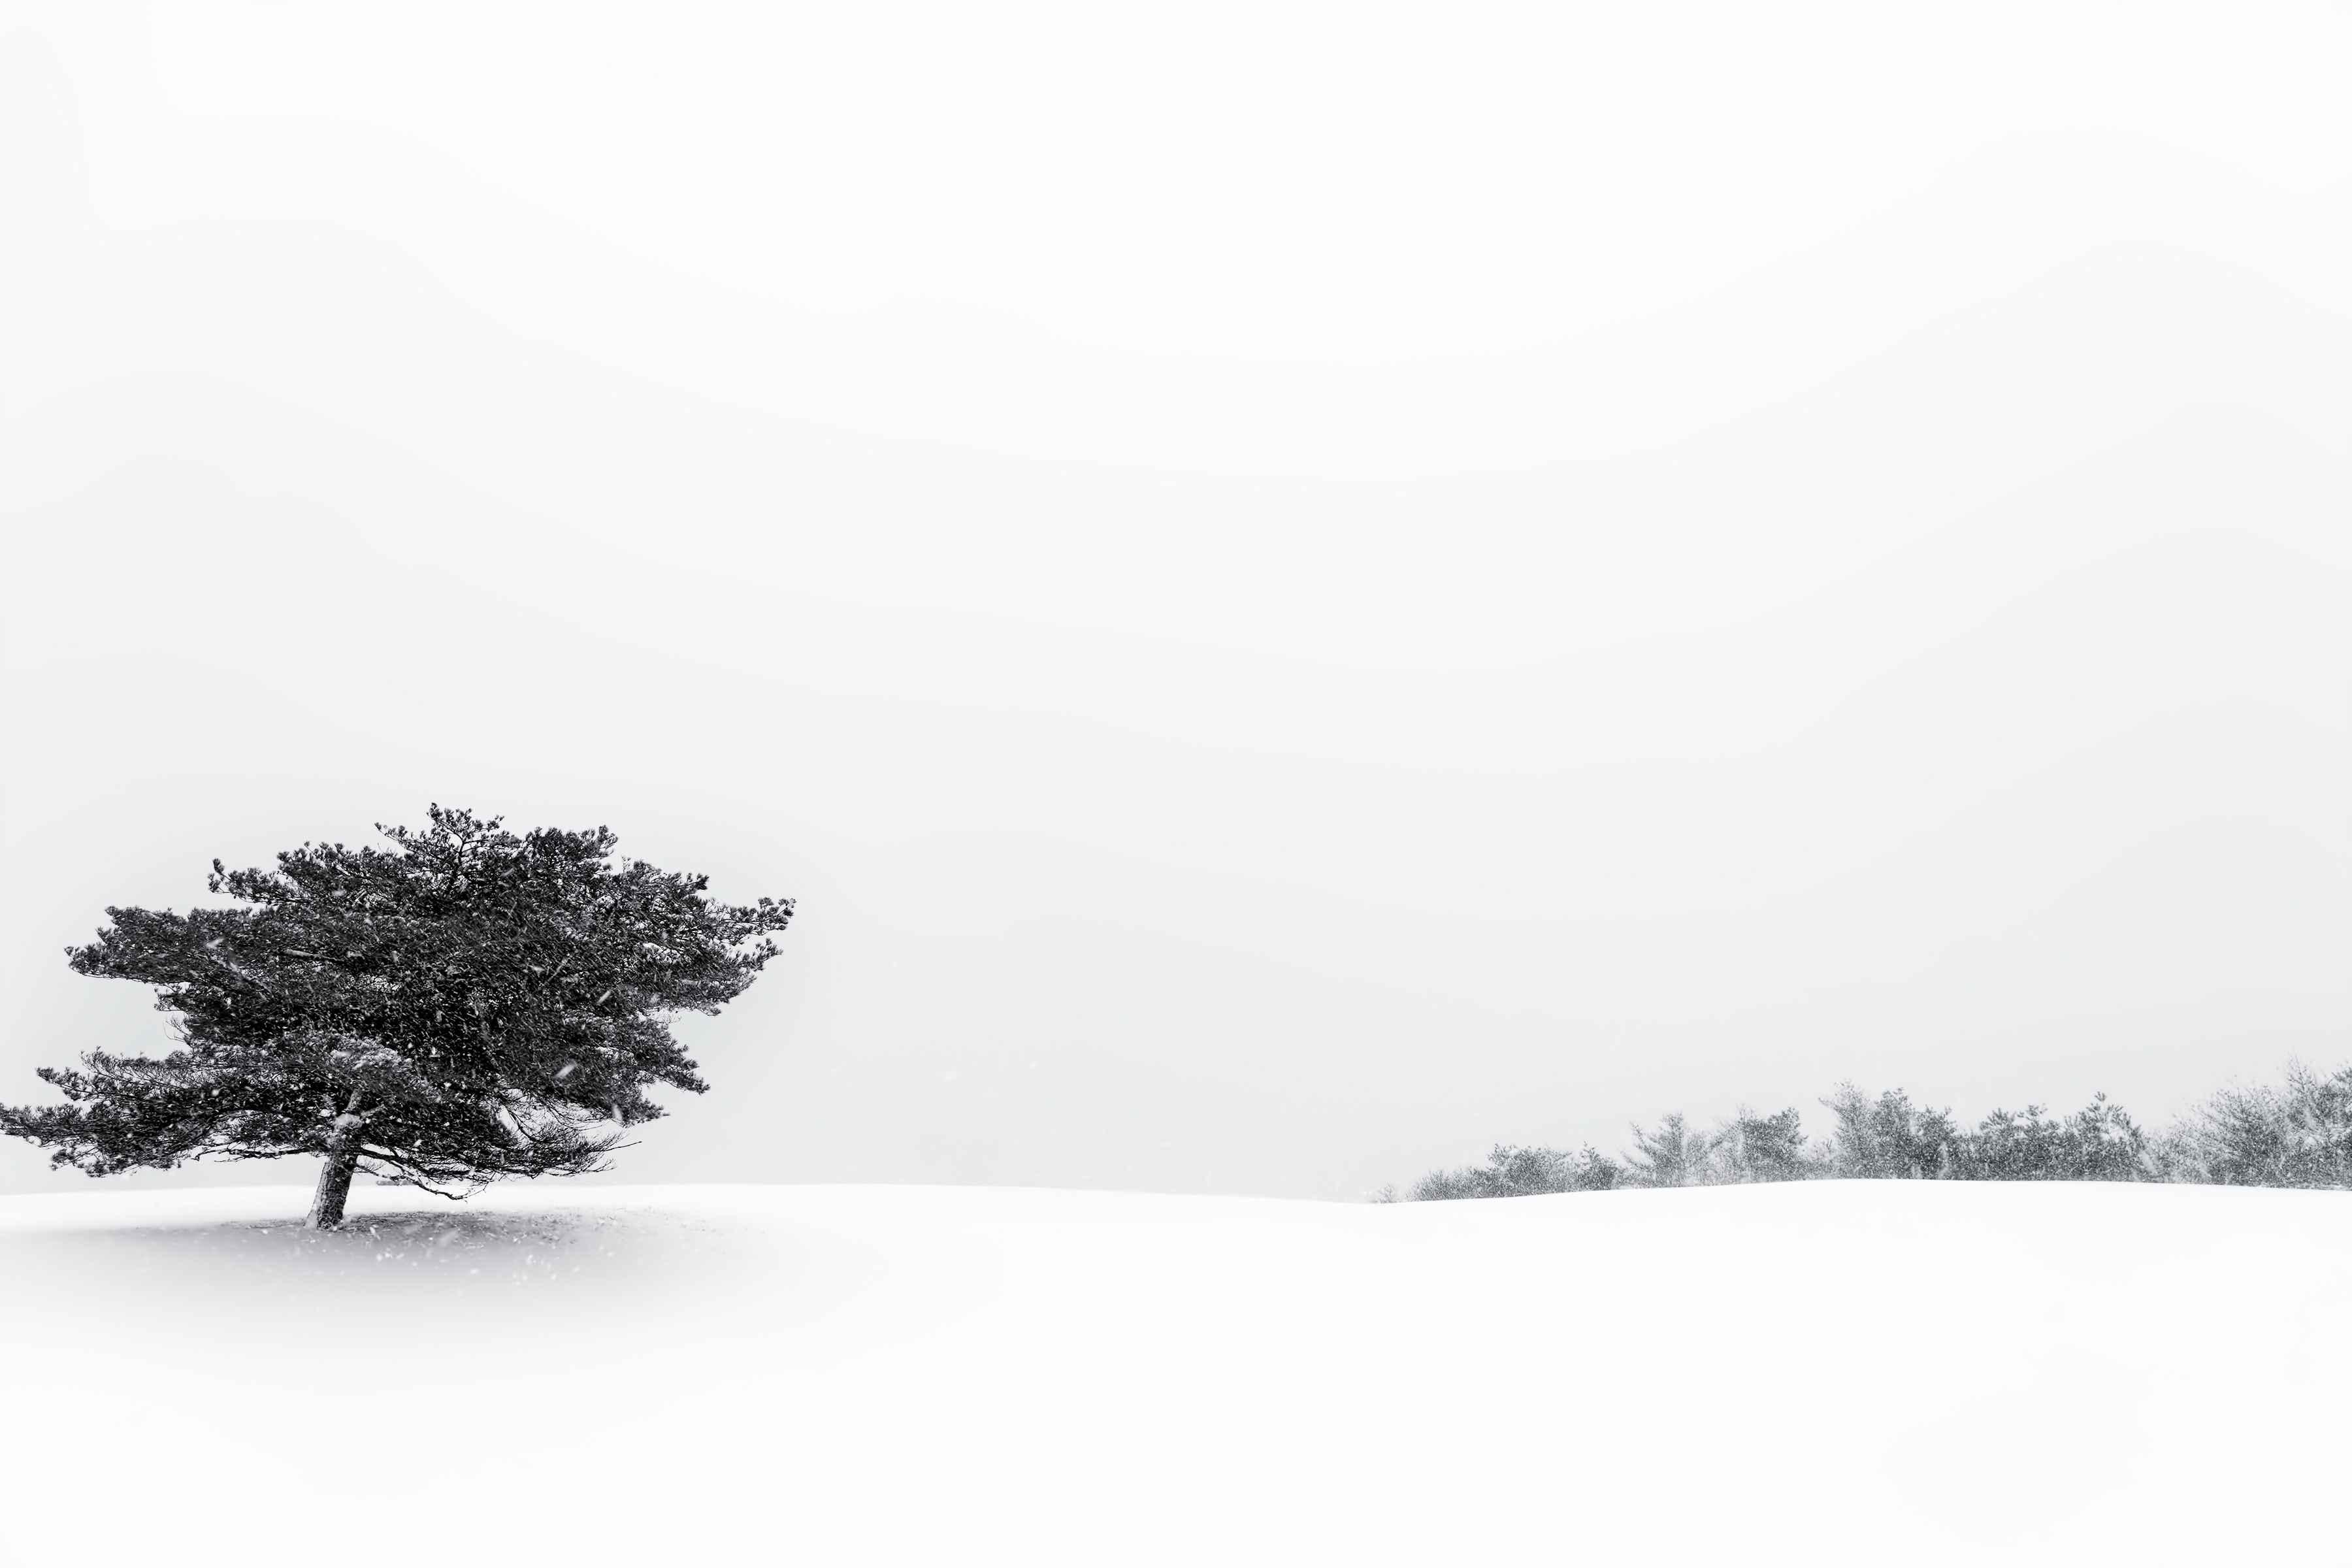 Winter Wind, Squibnoc... by  Michael Stimola - Masterpiece Online